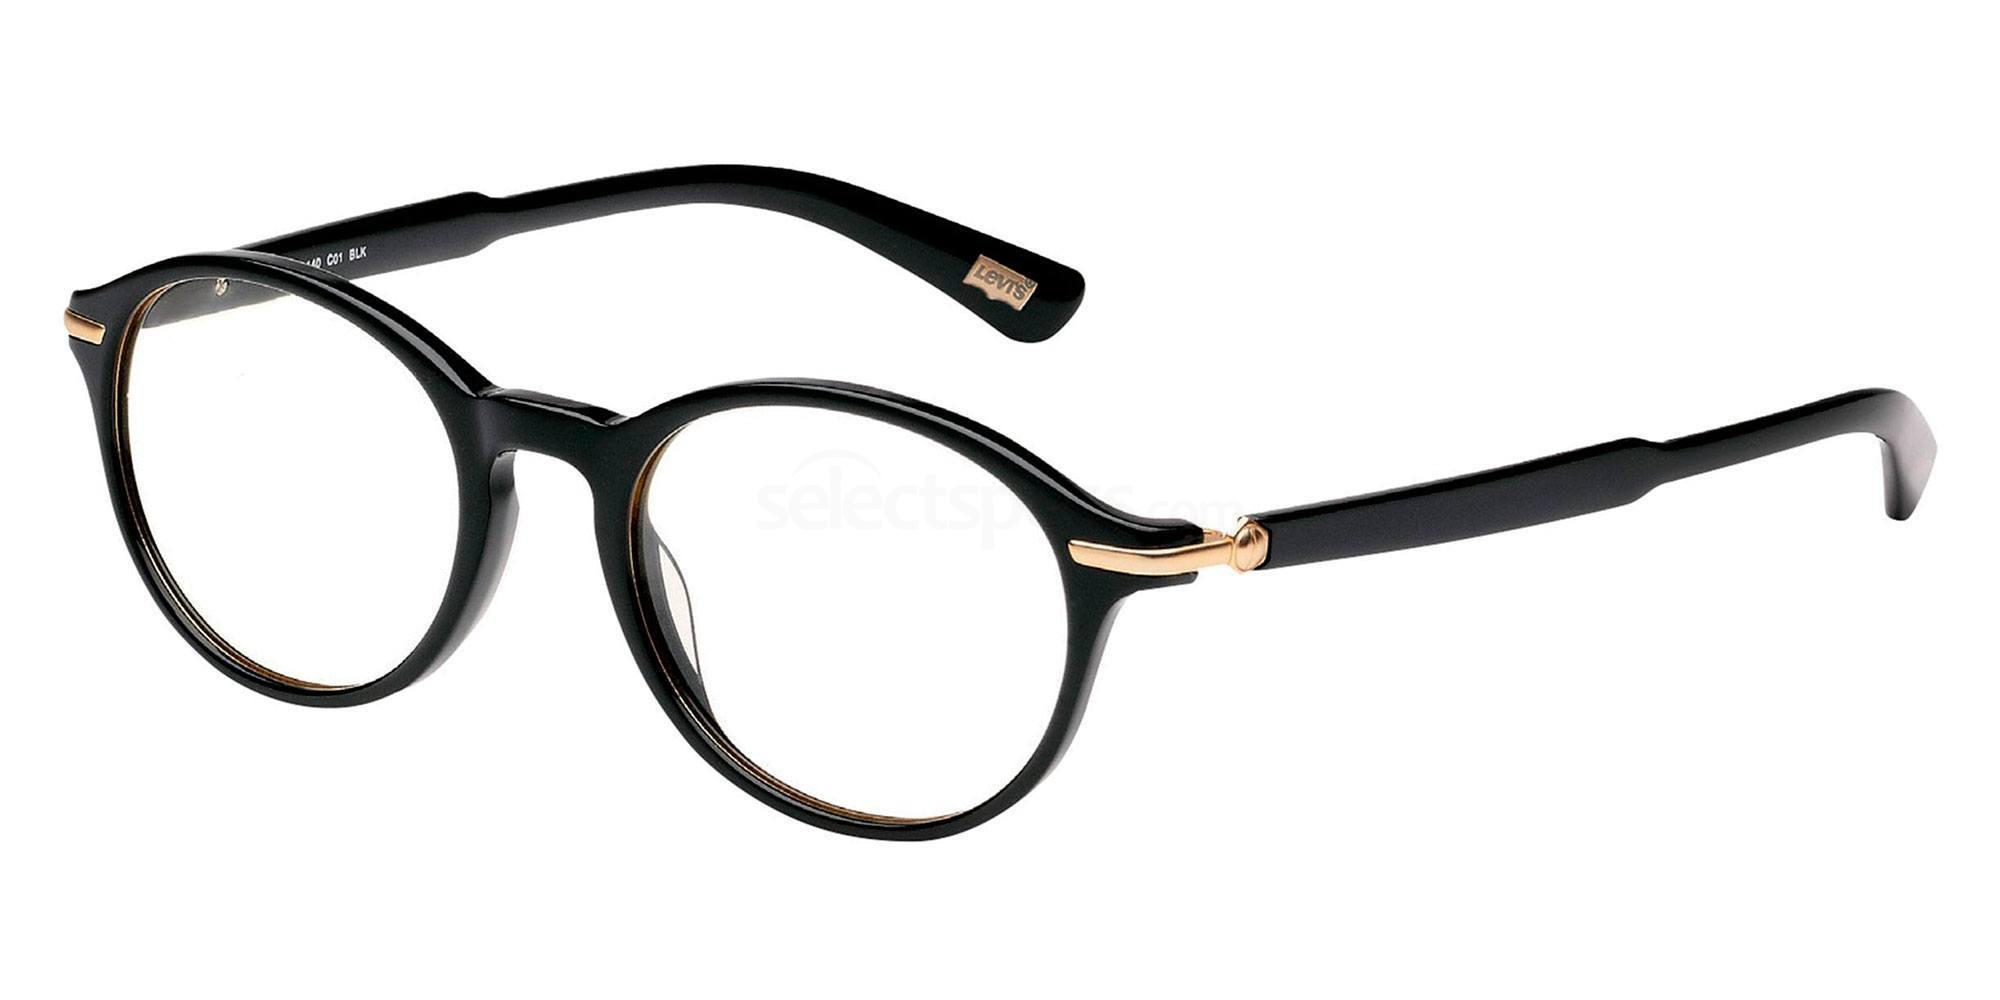 01 BLK LS114 Glasses, Levi's Eyewear